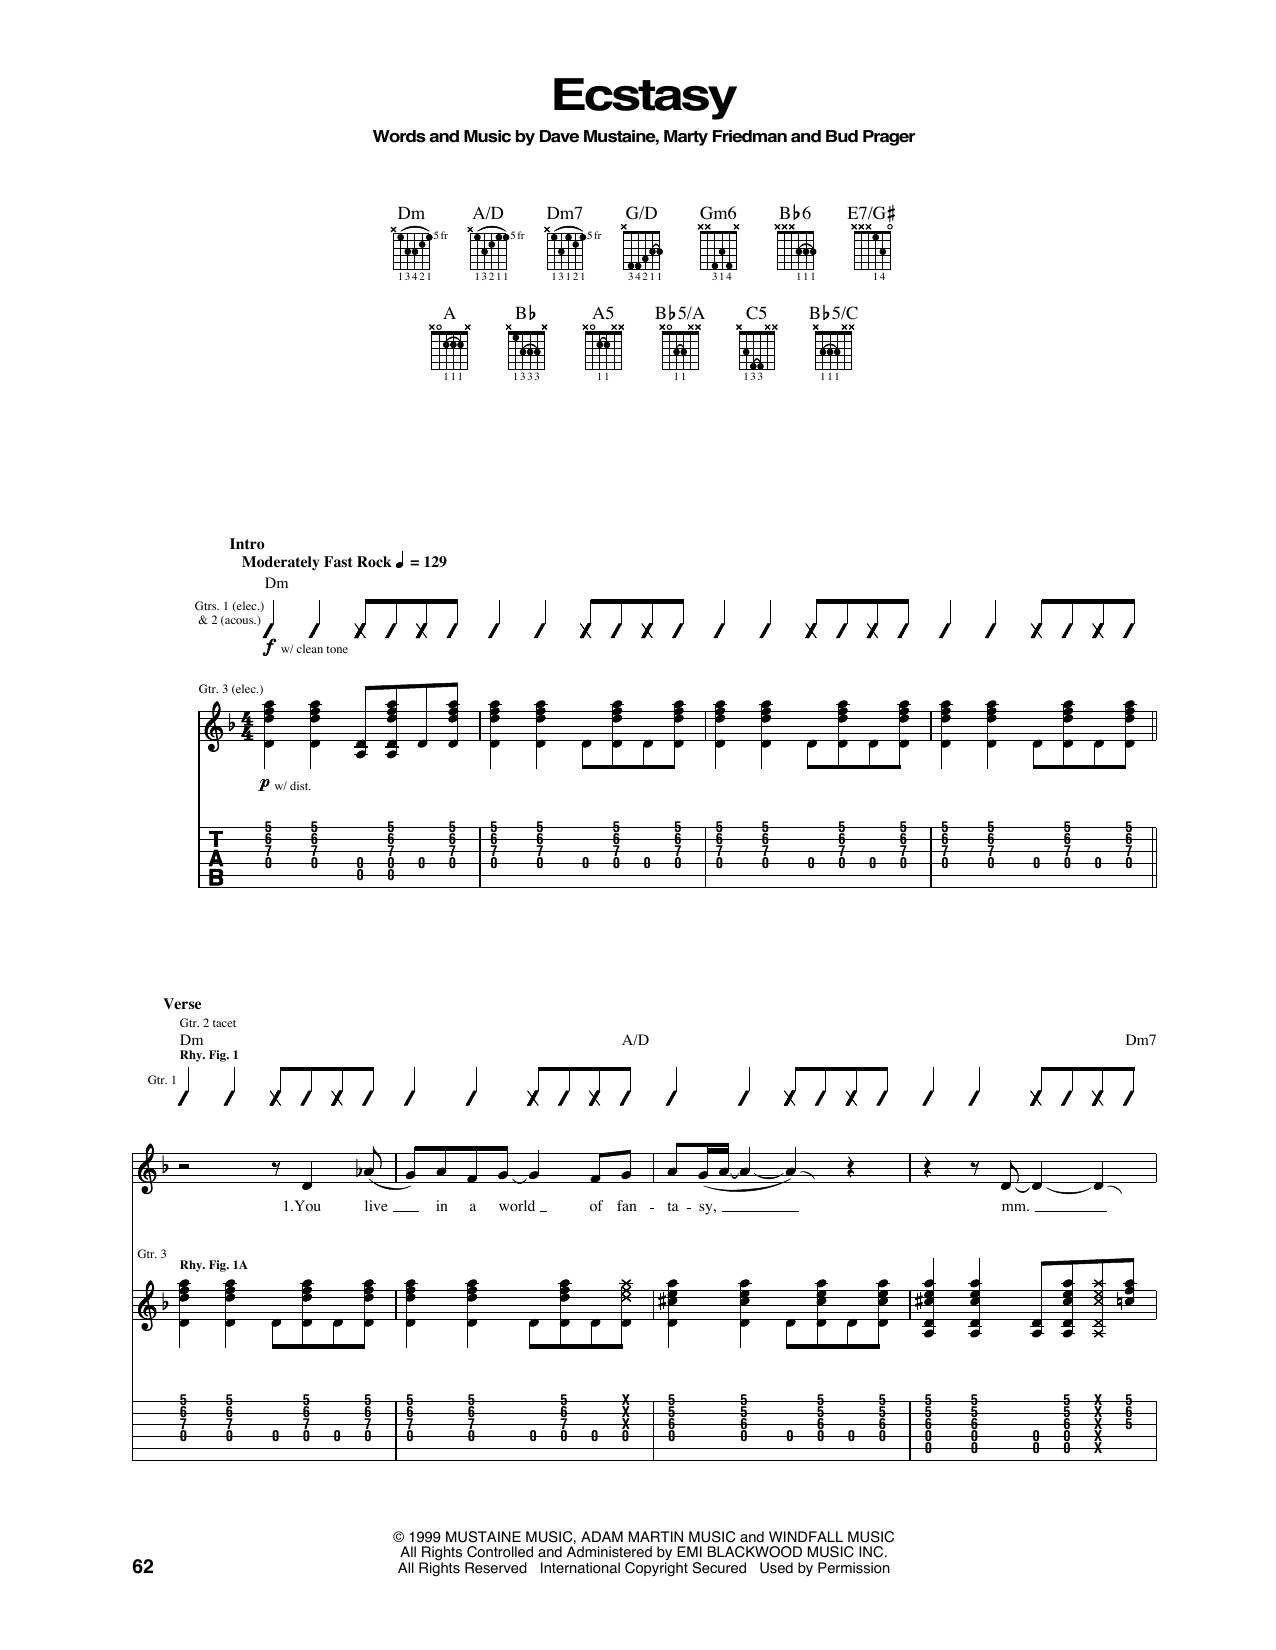 Megadeth - Ecstasy